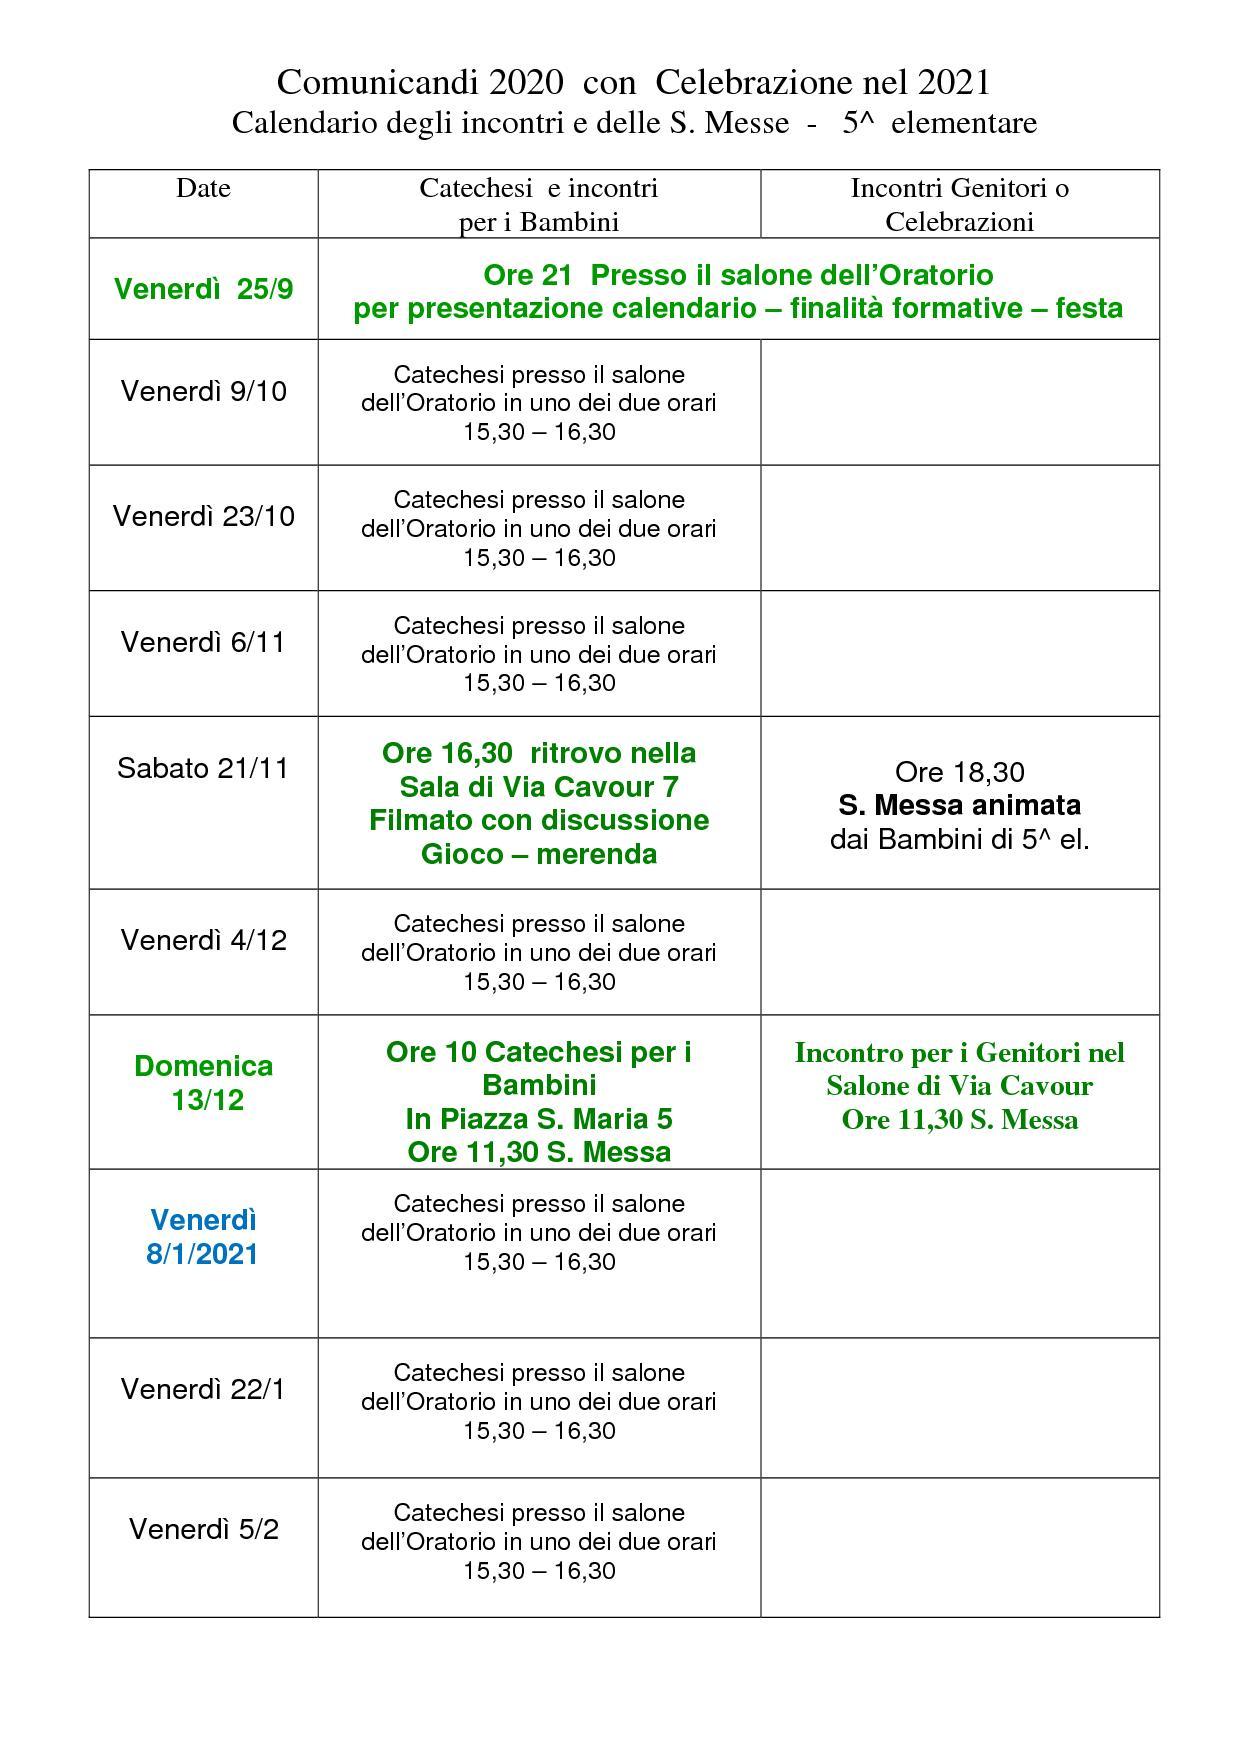 Oratorio - Catechismo Ott 20 (06)